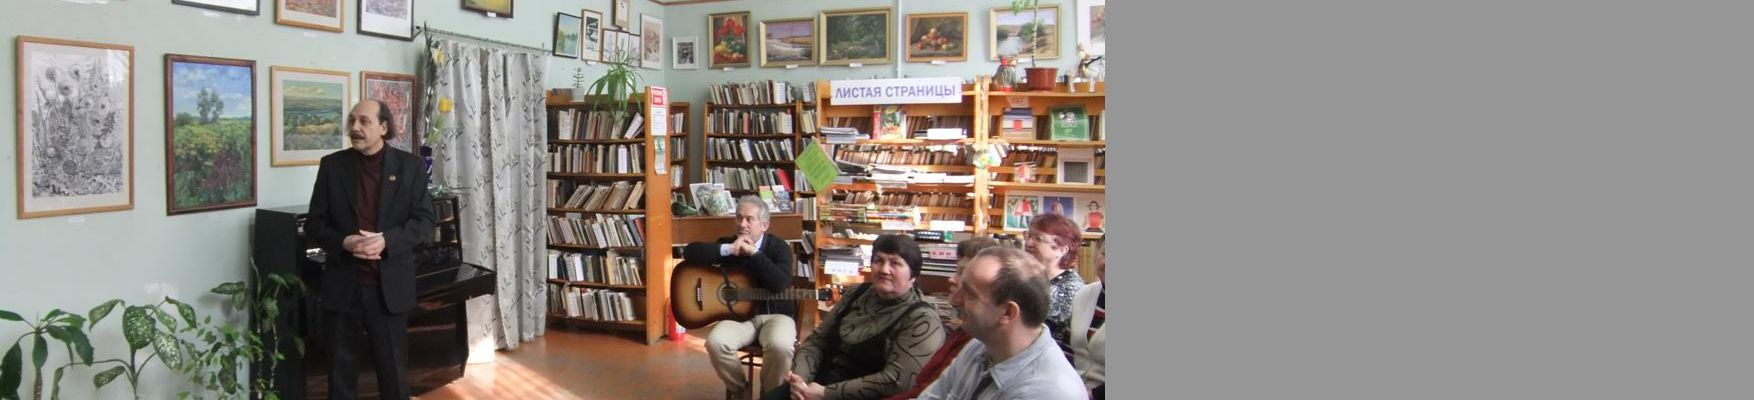 Библиотека им. М.Горького